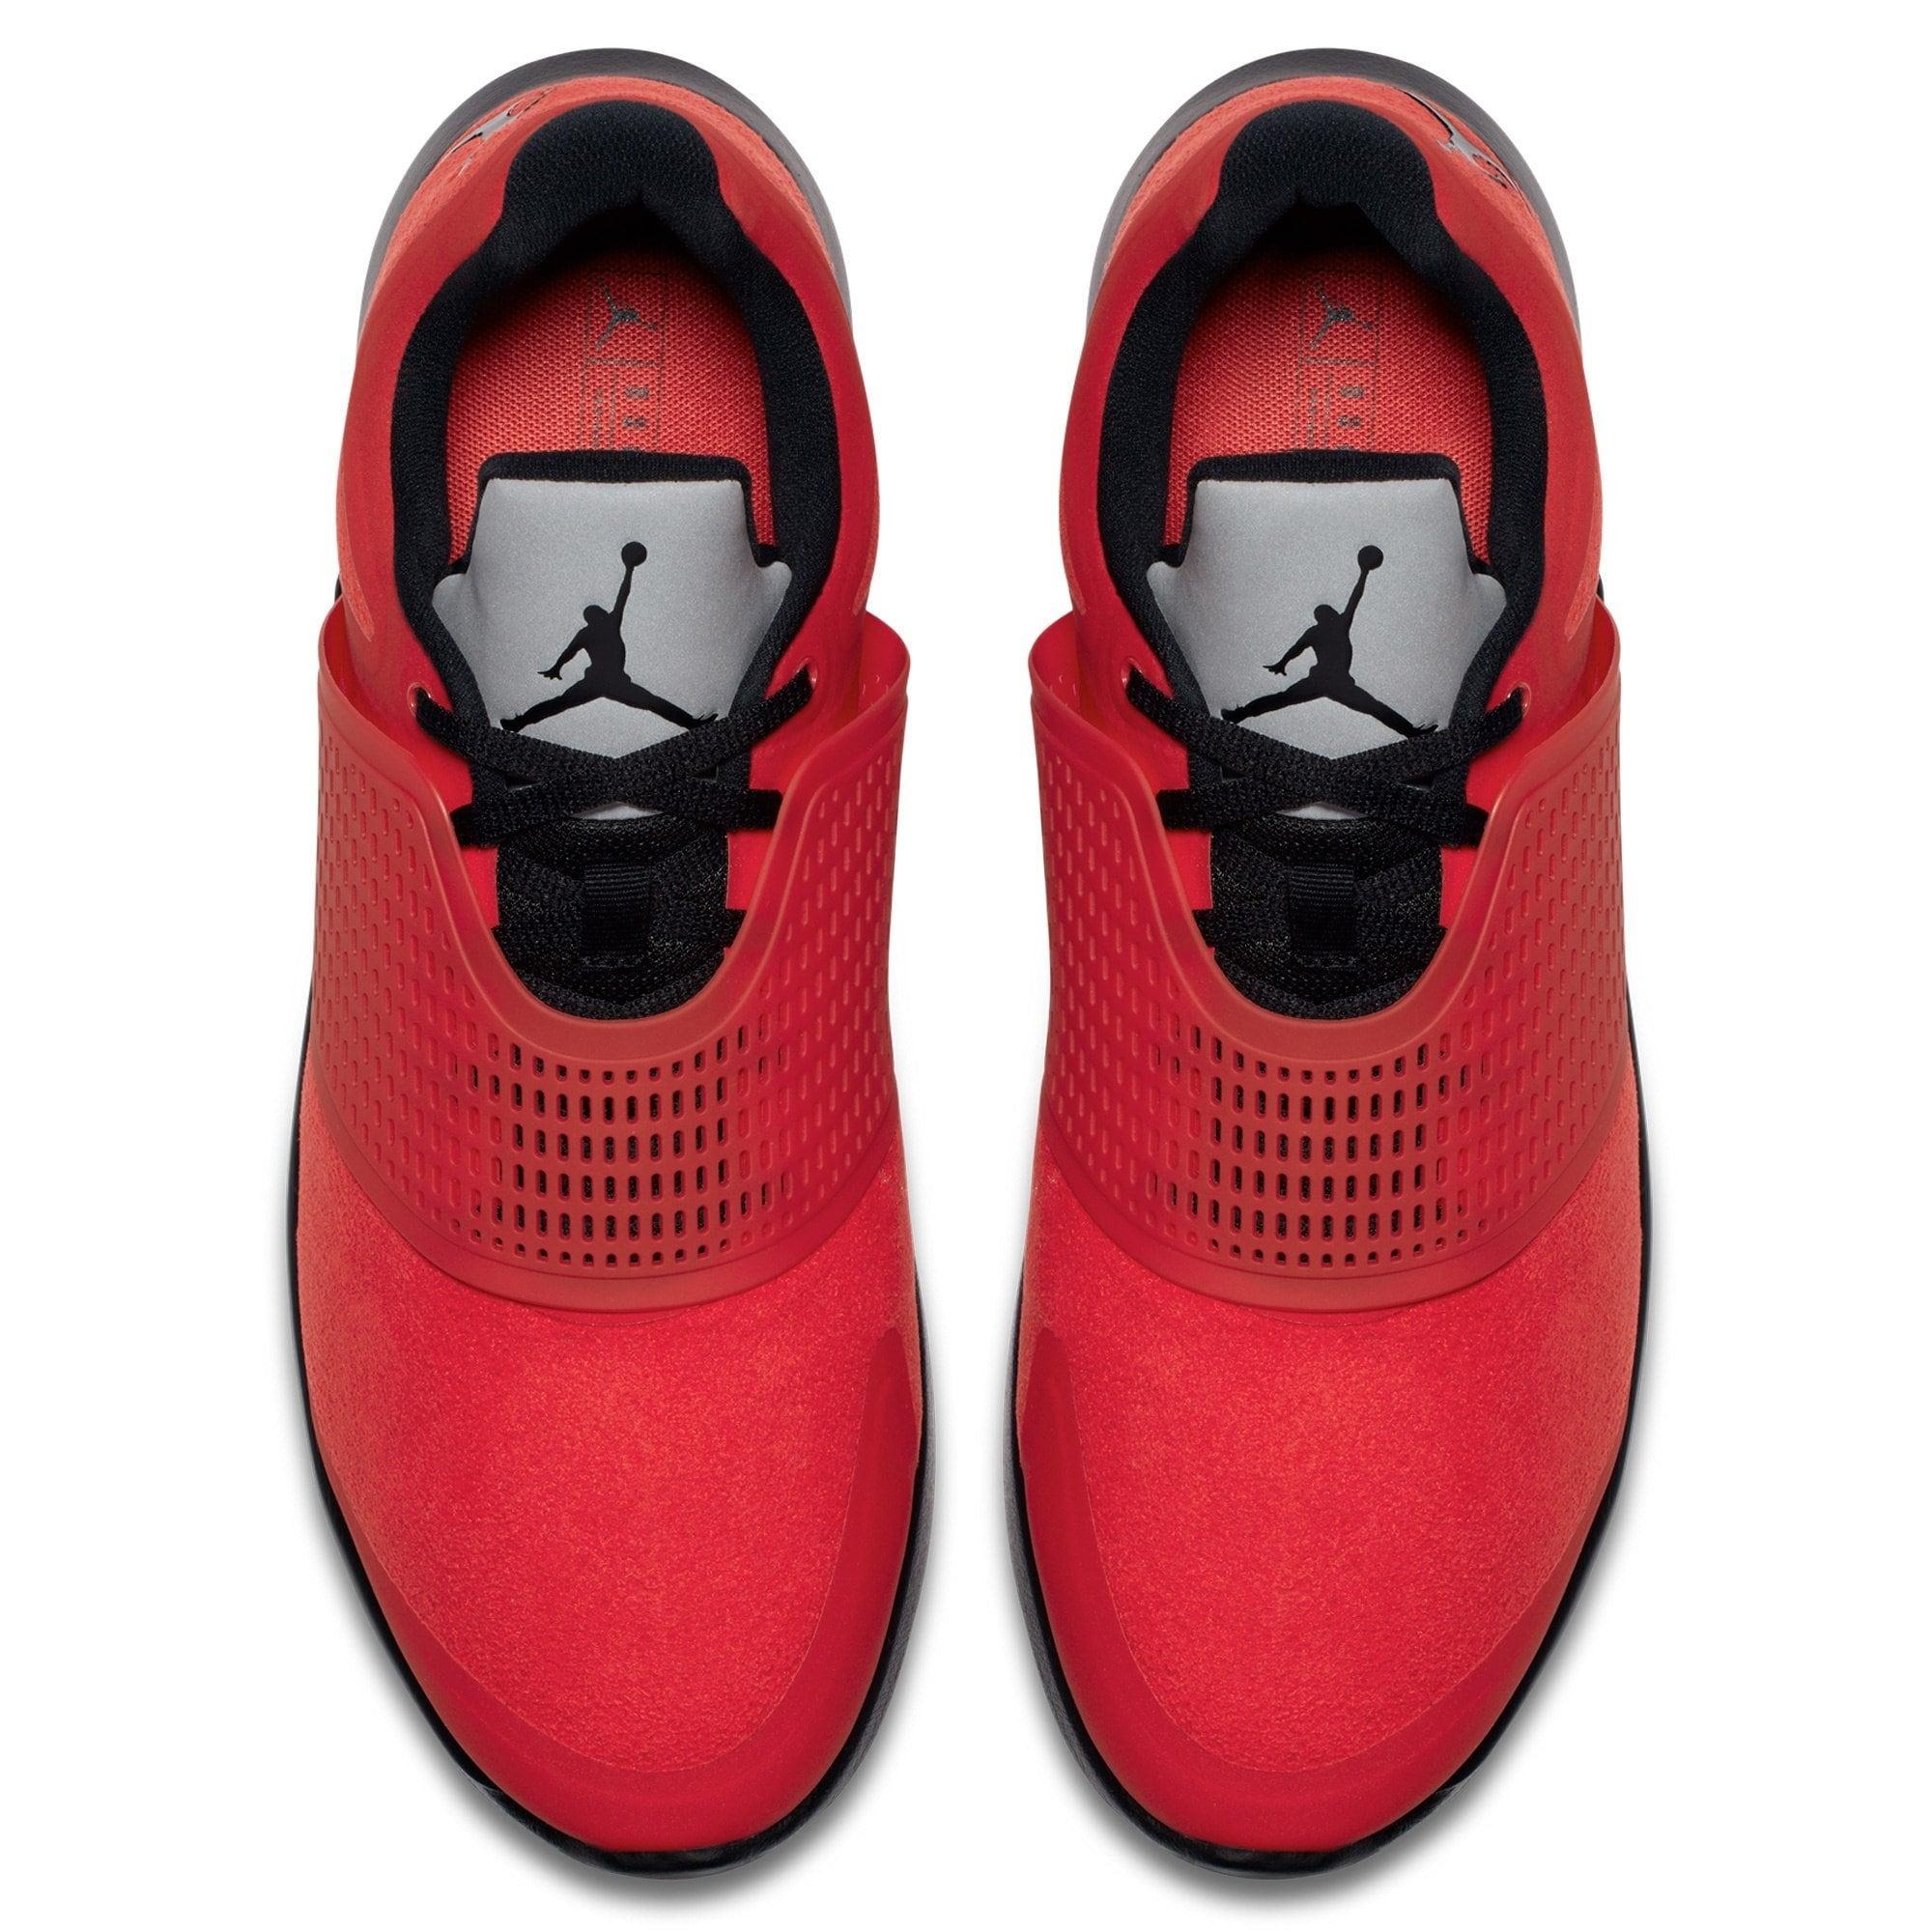 92f5d92e6be Shop Nike Men's Jordan Grind 2 University Red/Black/White (AO9567 600) -  Free Shipping Today - Overstock - 25572127